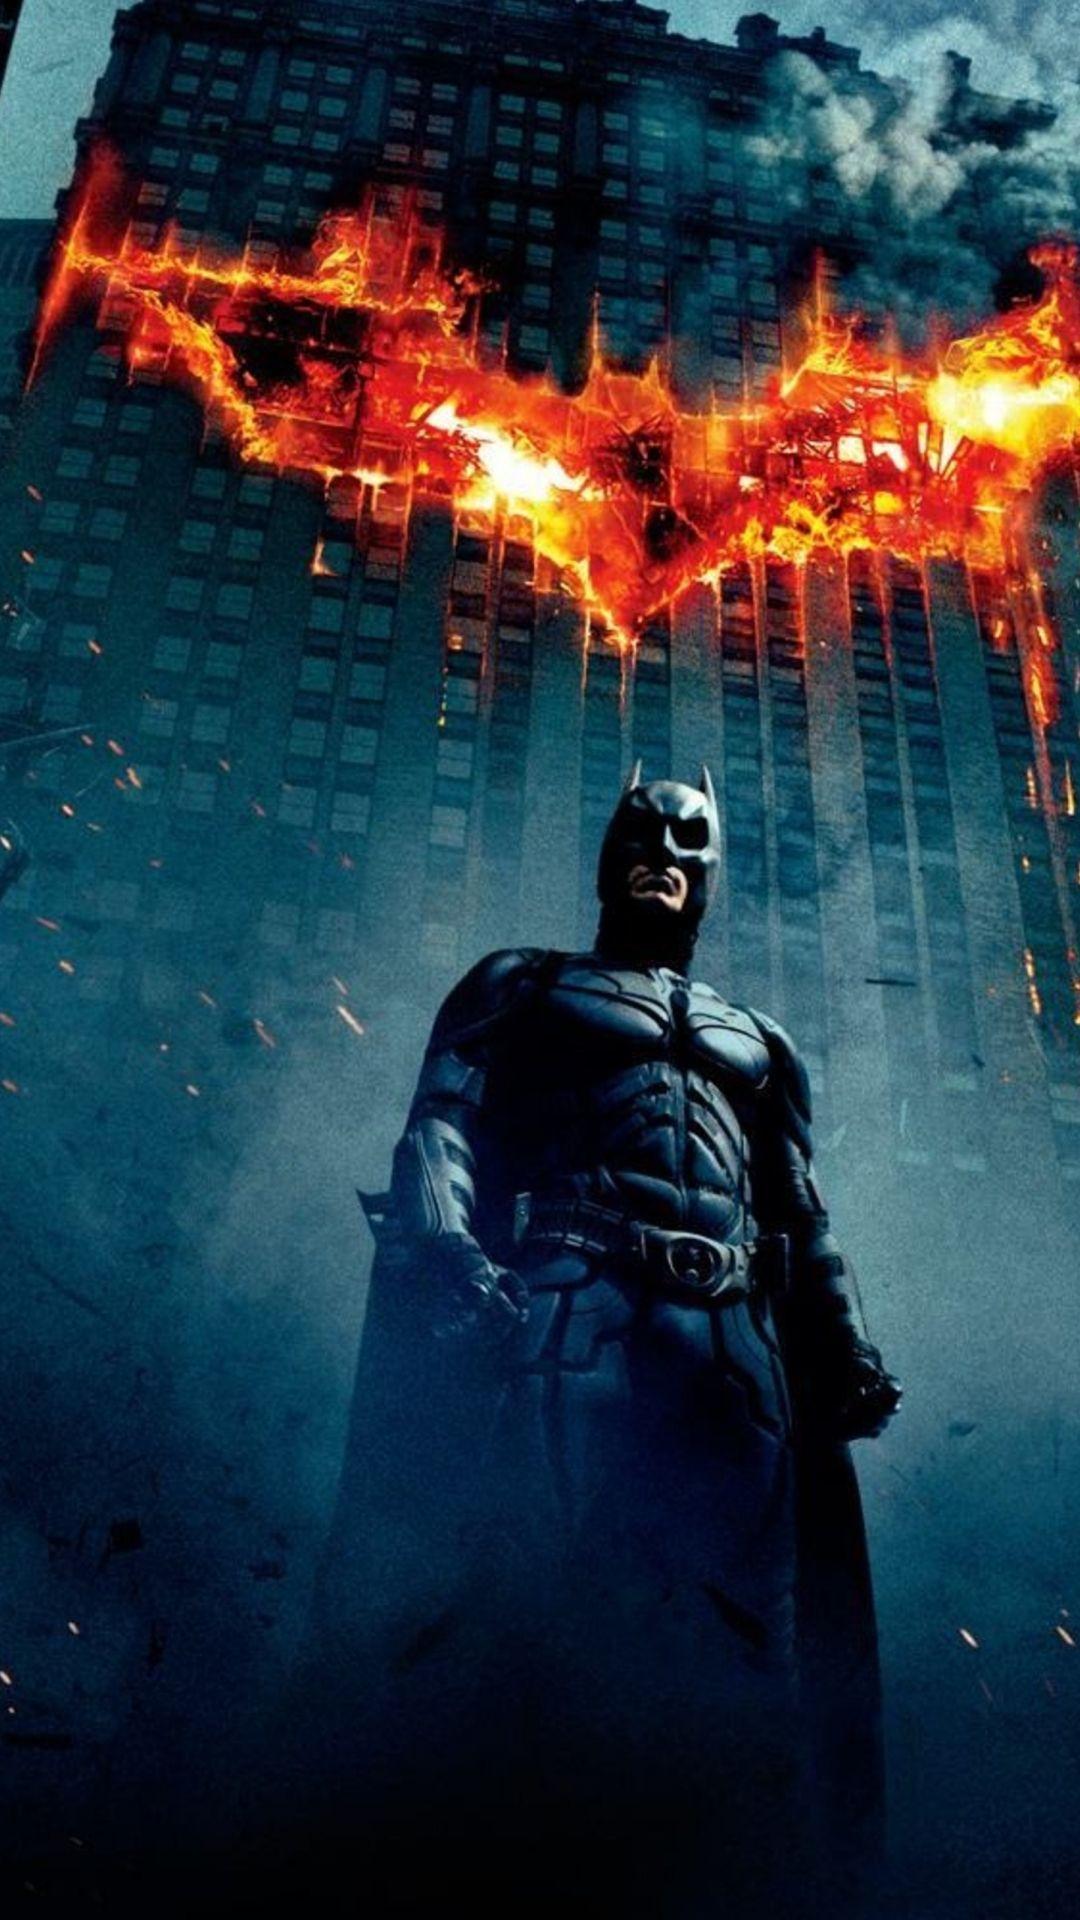 Dark Knight Batman Wallpaper Iphone In 2020 Batman Wallpaper Iphone Batman Dark Batman Backgrounds